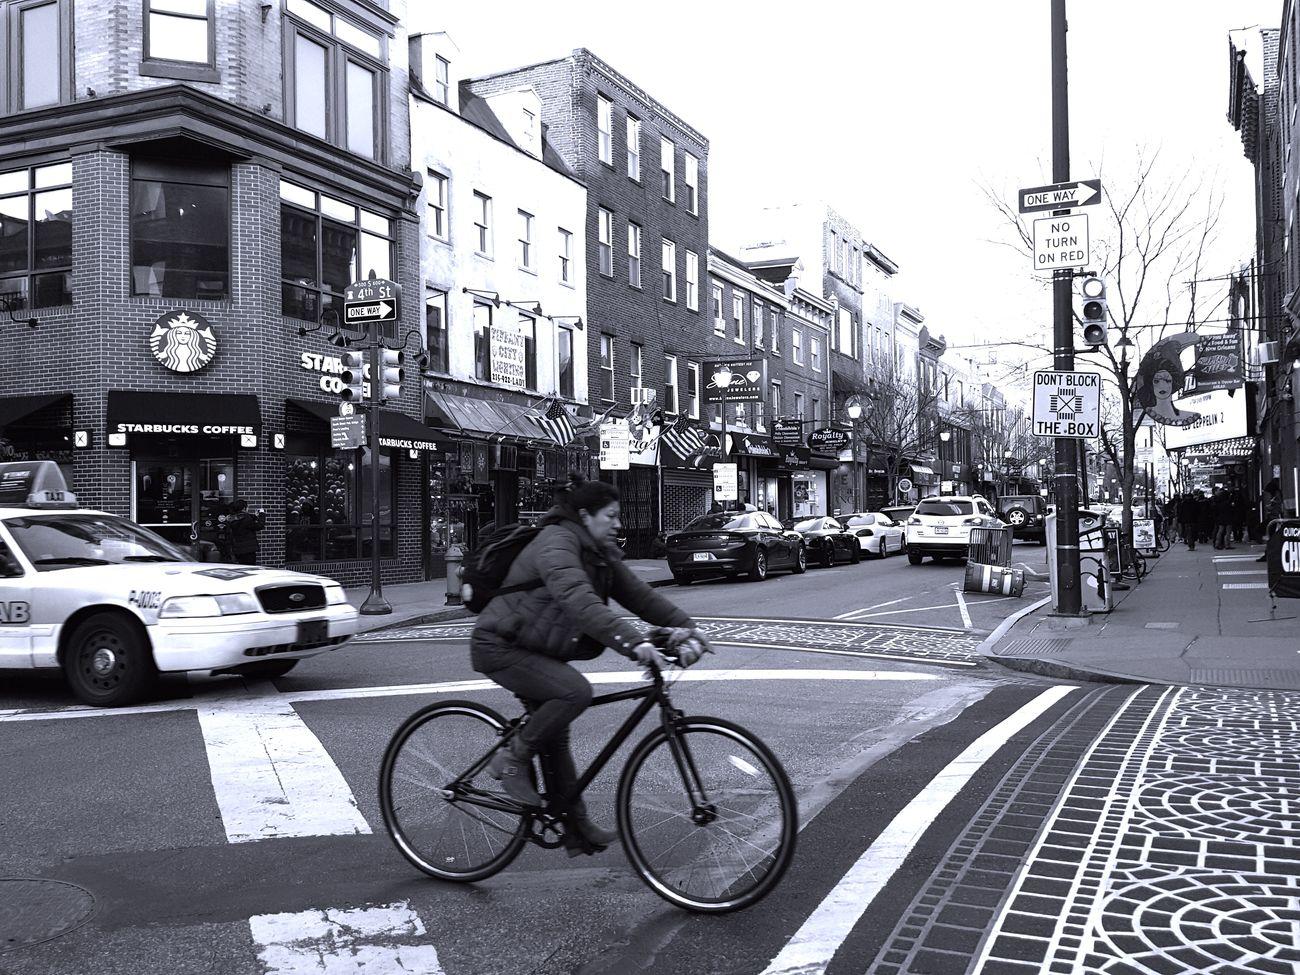 AMPt - Shoot Or Die EyeEm Masterclass AMPt_community Shootermag Streetphotography Streetphoto_bw Philly Philadelphia Blackandwhite Bike Hanging Out Eye4photography  AMPt - Silver Lining at Philadelphia, Philadelphia County, Pennsylvania, United States